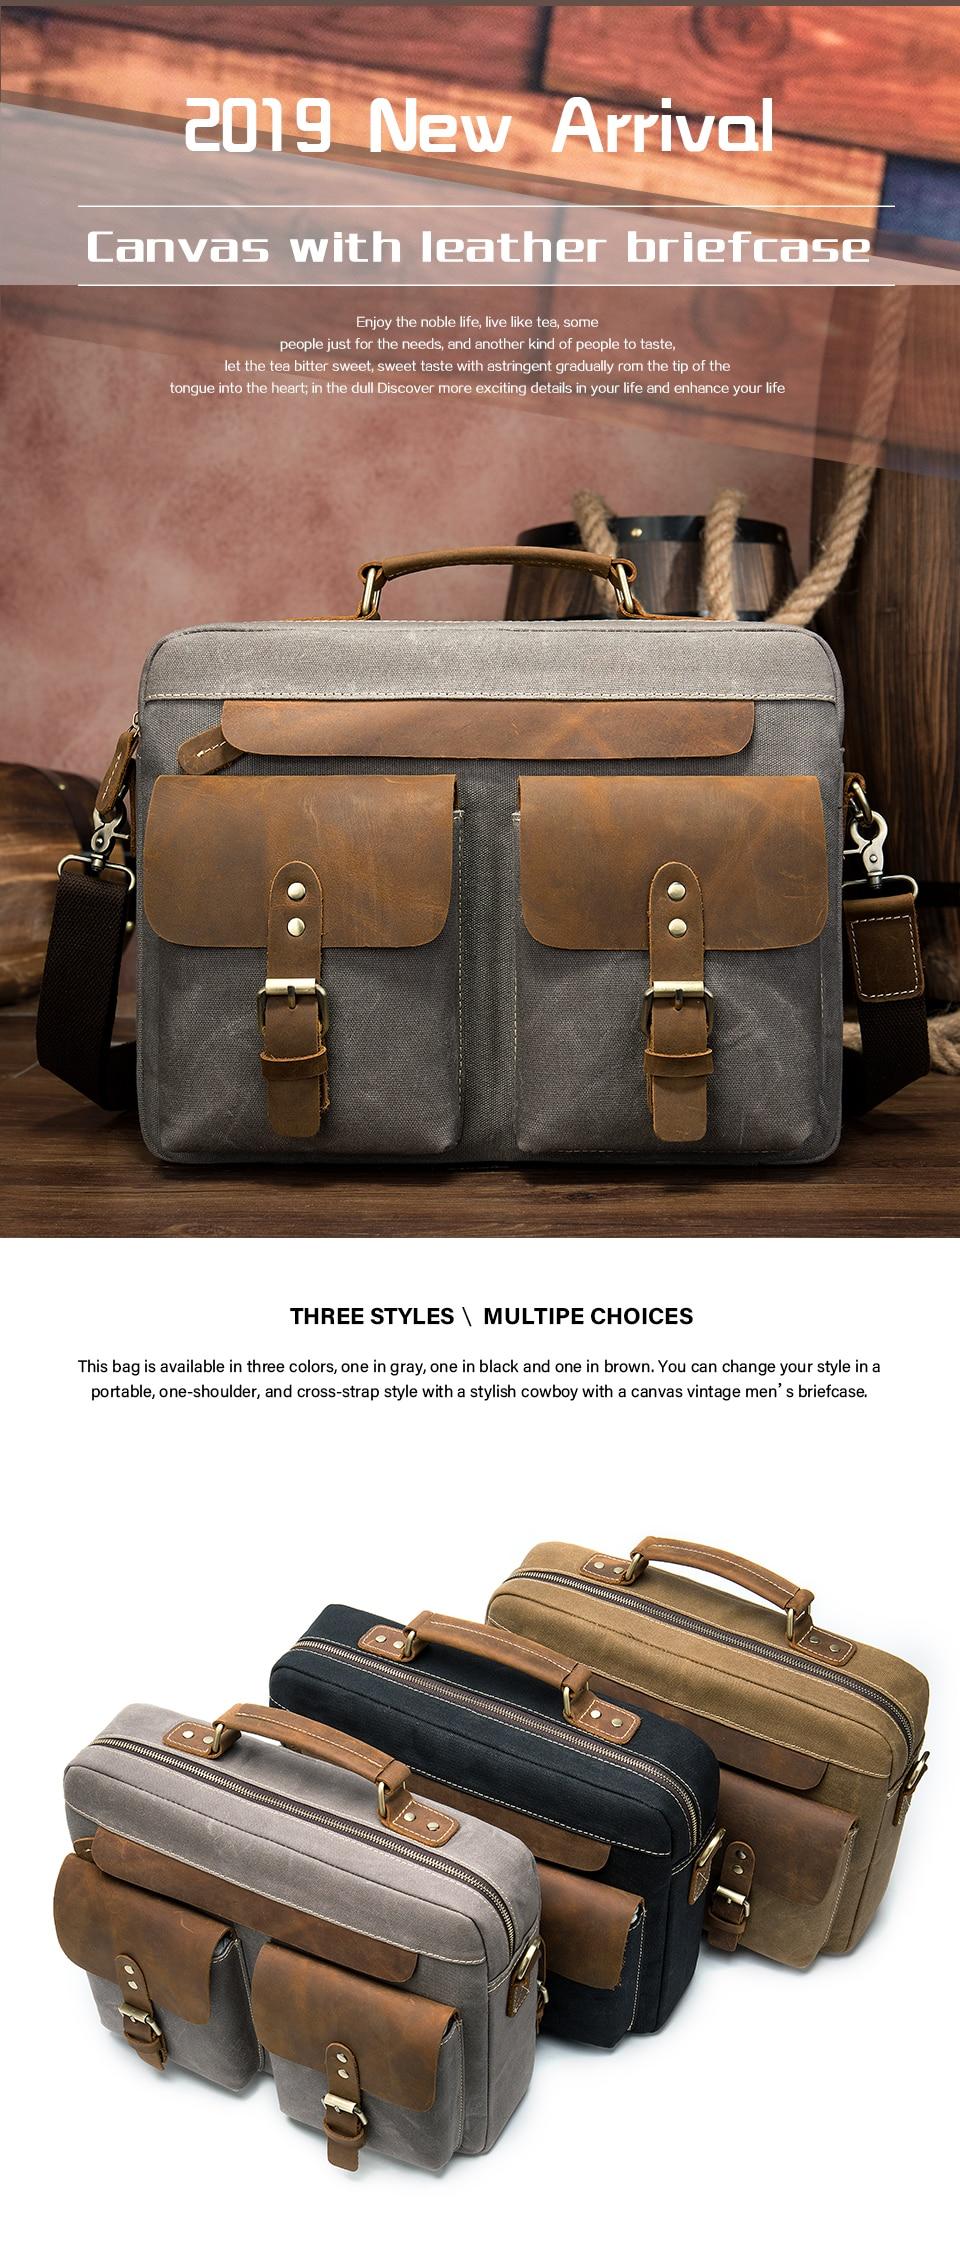 Hc72b52ea2dcd40ae880bdeb9d639ad60e WESTAL Men Briefcases Men's Bag Genuine Leather Business Office Bags for Men Laptop Bag Leather Briefcases Male Lawyer Bags